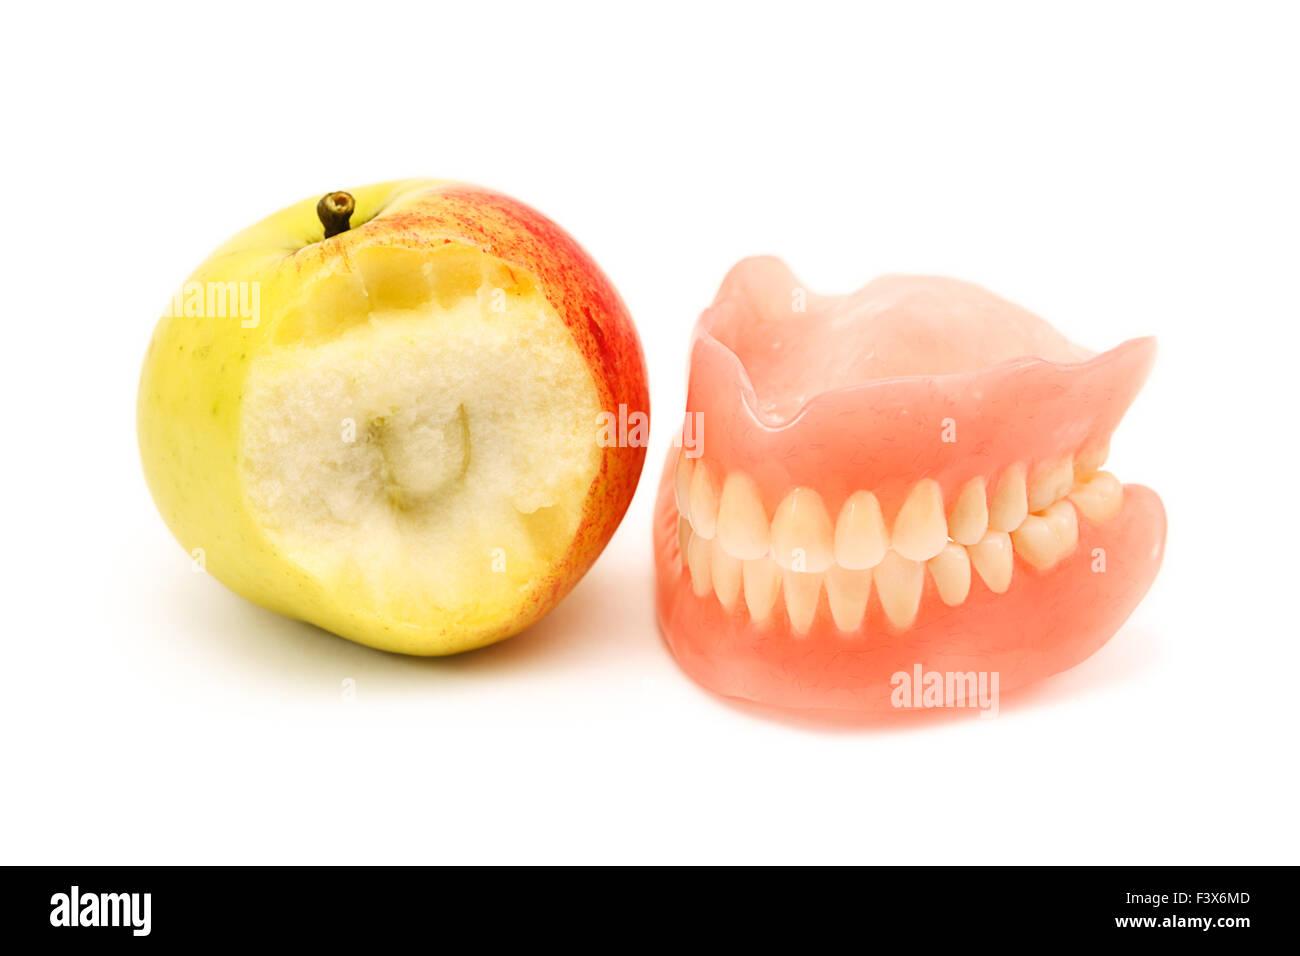 Denture and bitten apple - Stock Image